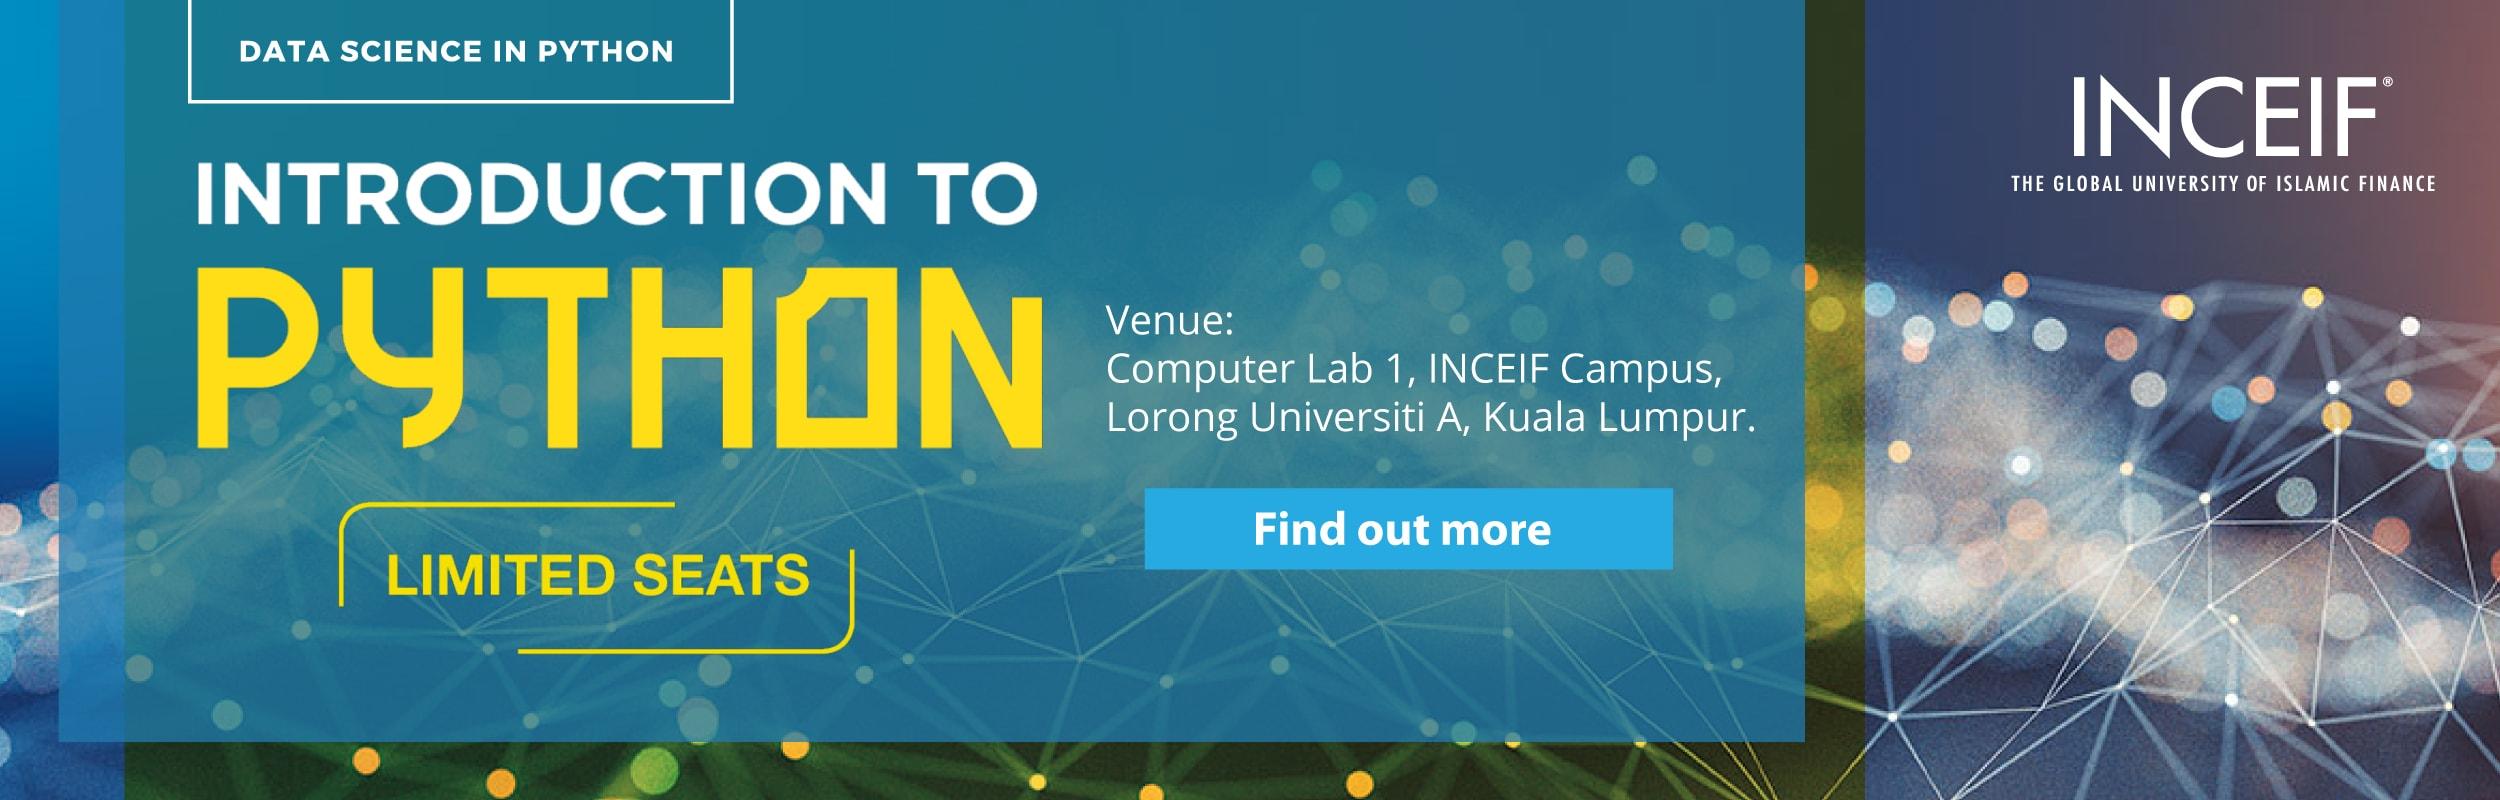 INCEIF | The Global University of Islamic Finance